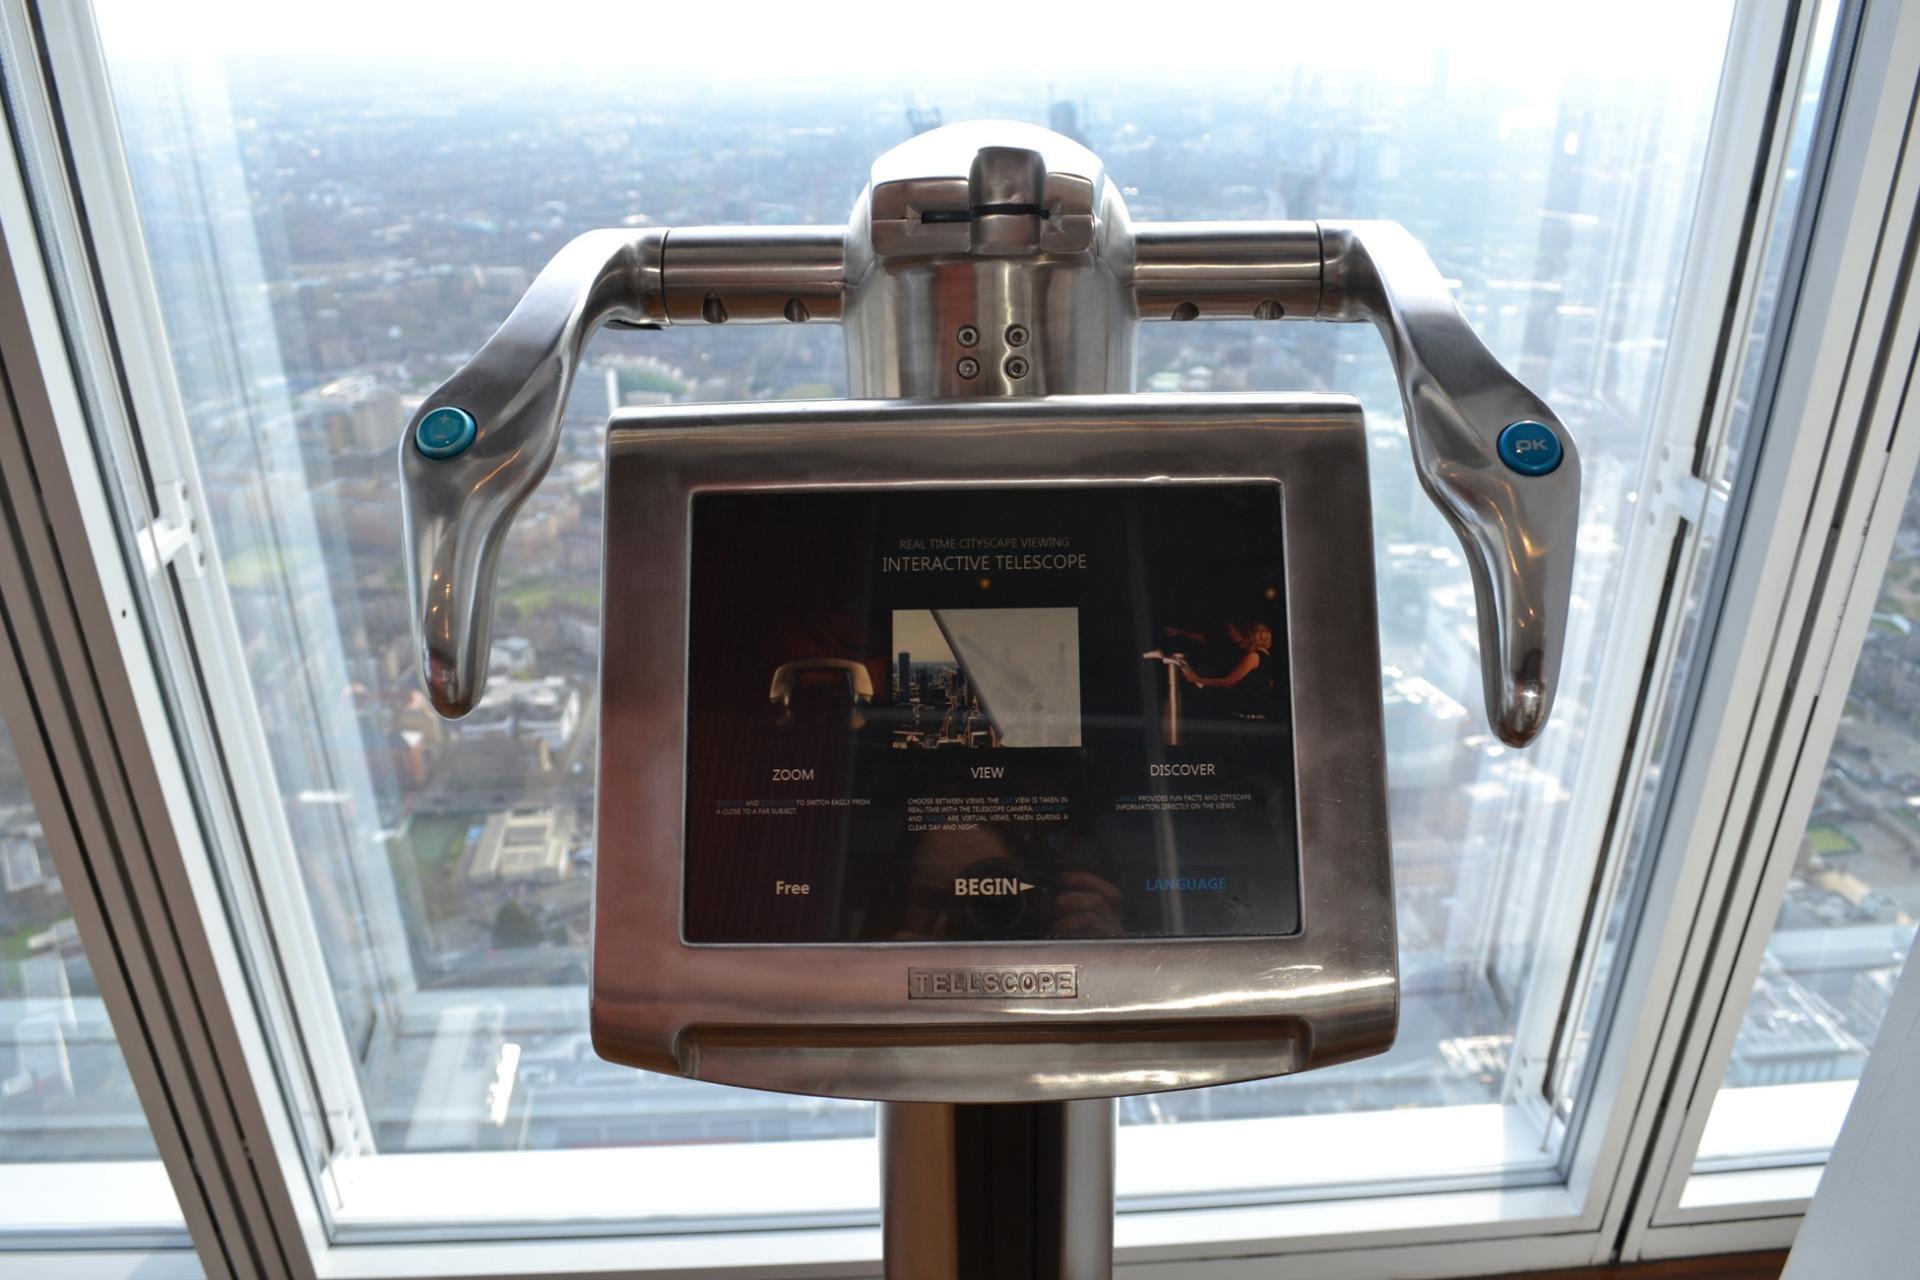 Pantalla interactiva en el the Shard